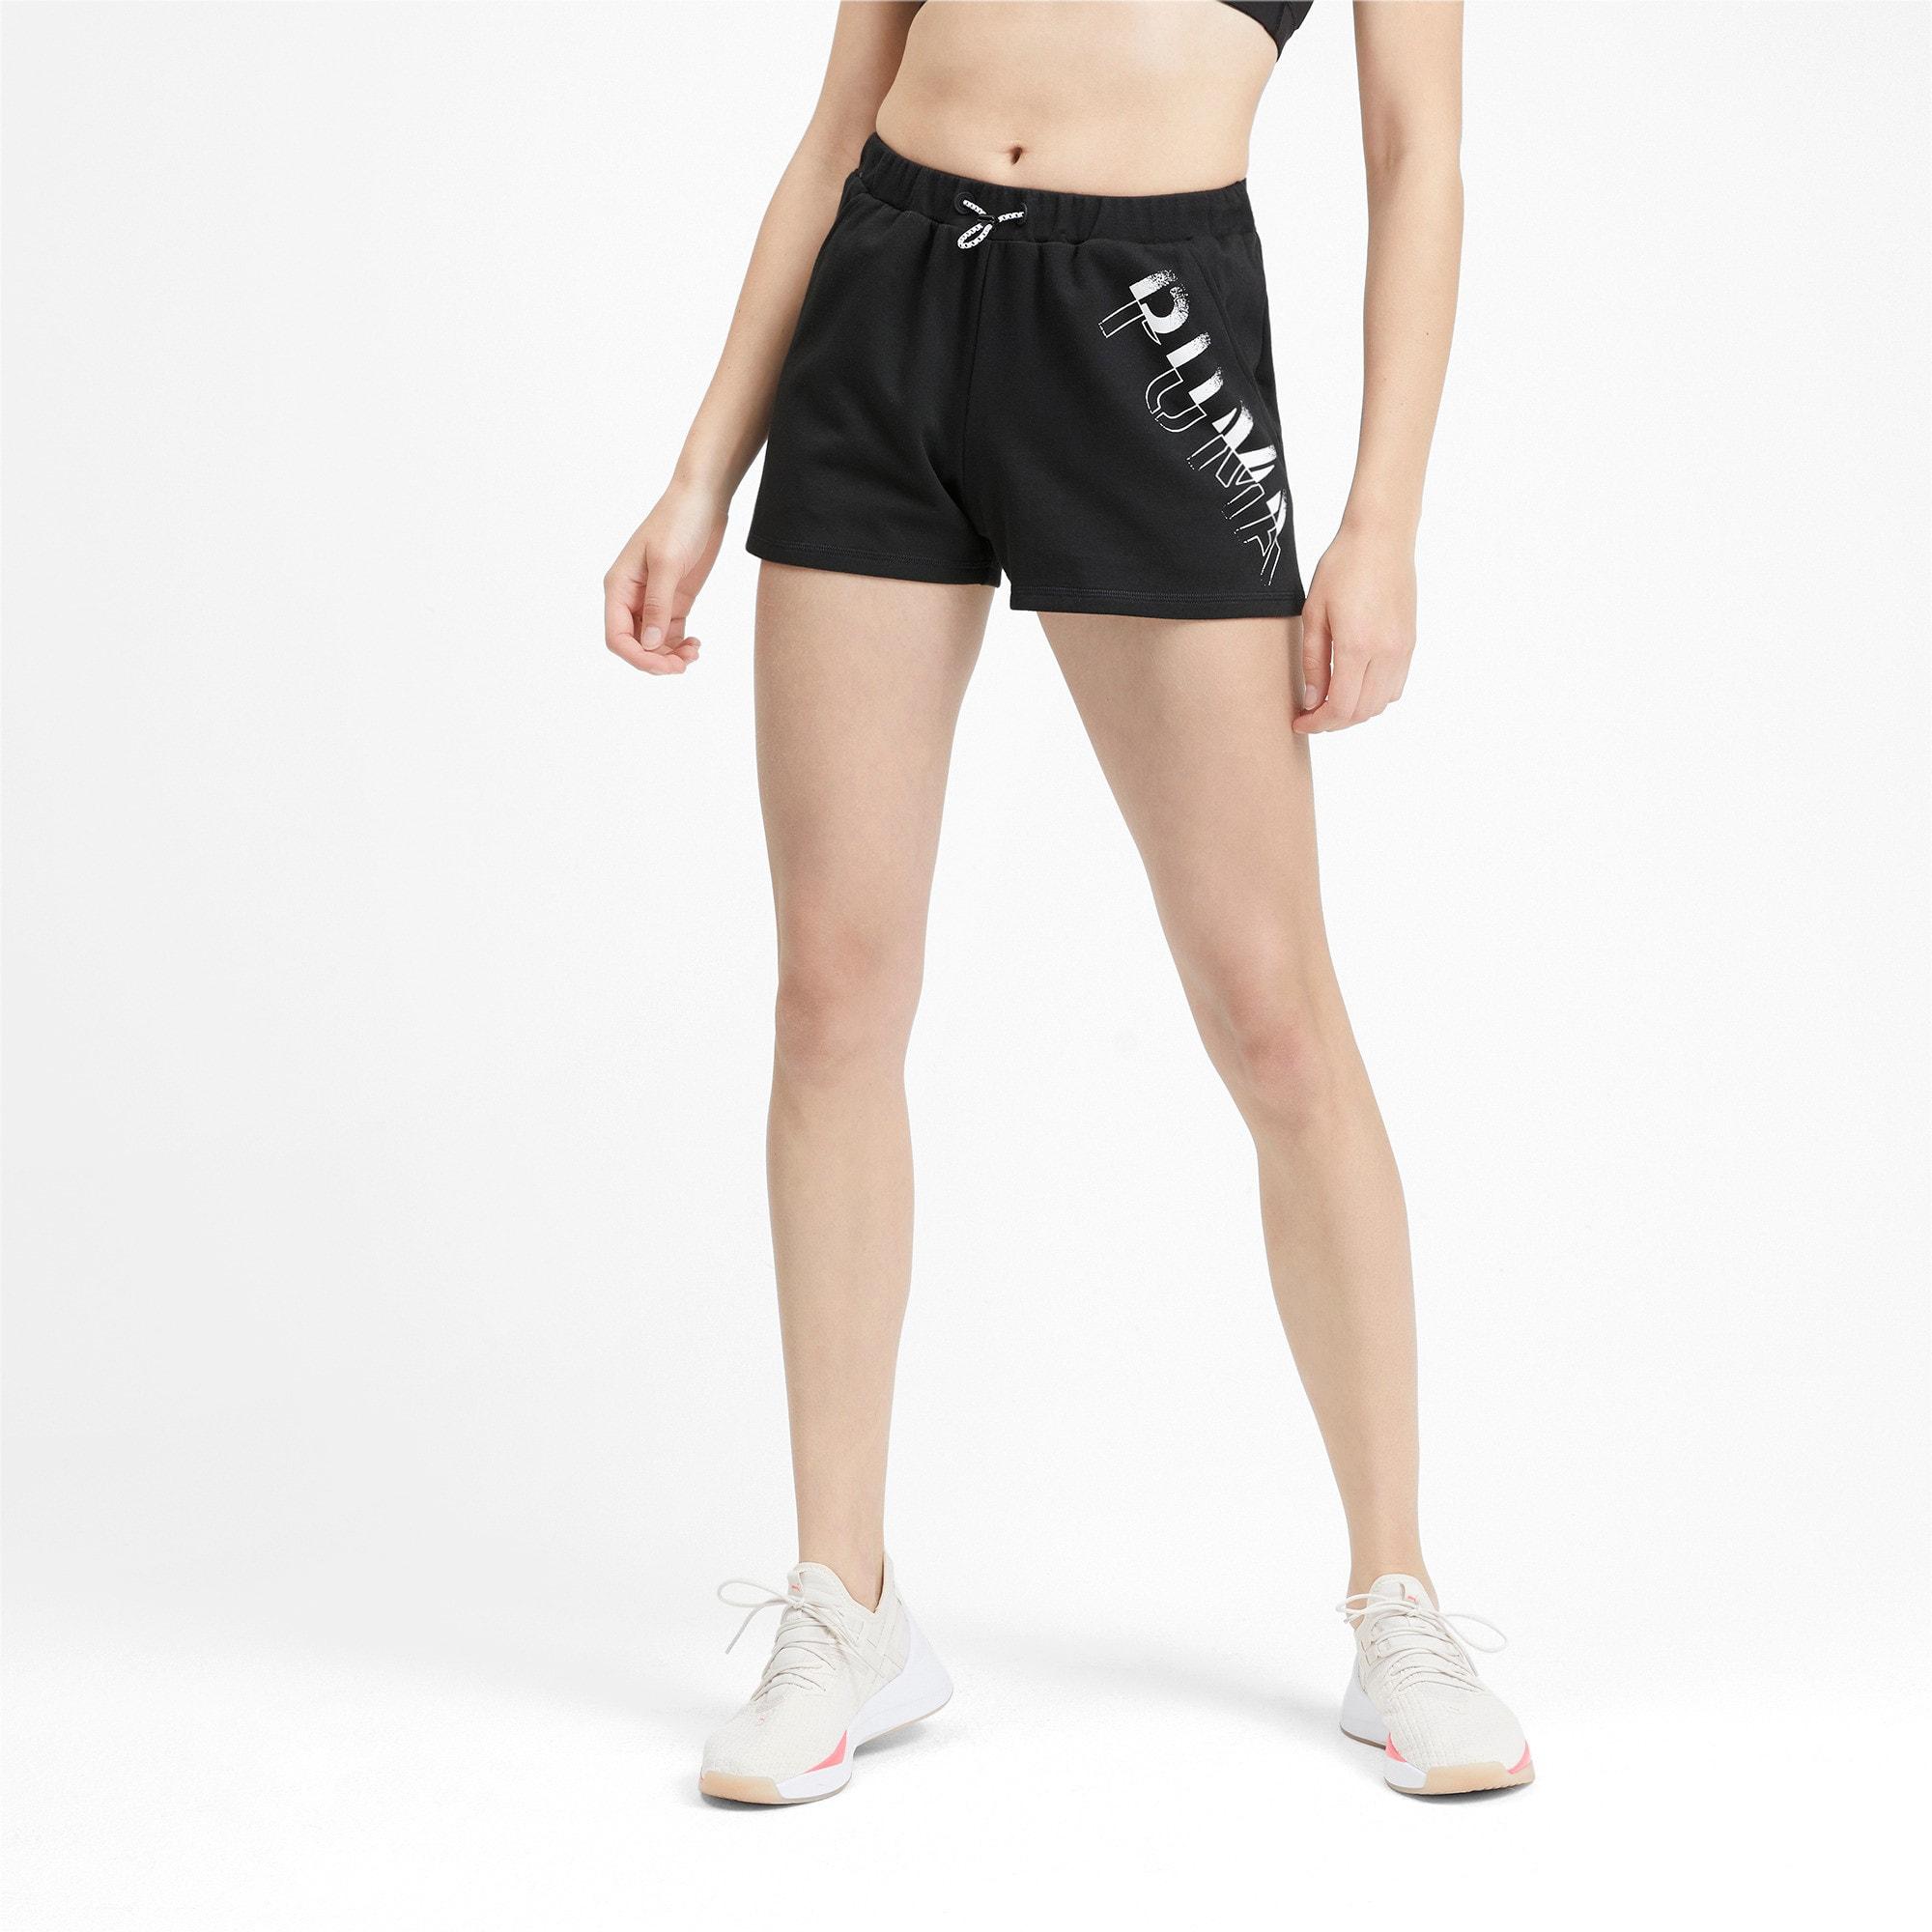 Miniatura 2 de Shorts HIT Feel It para mujer, Puma Black, mediano